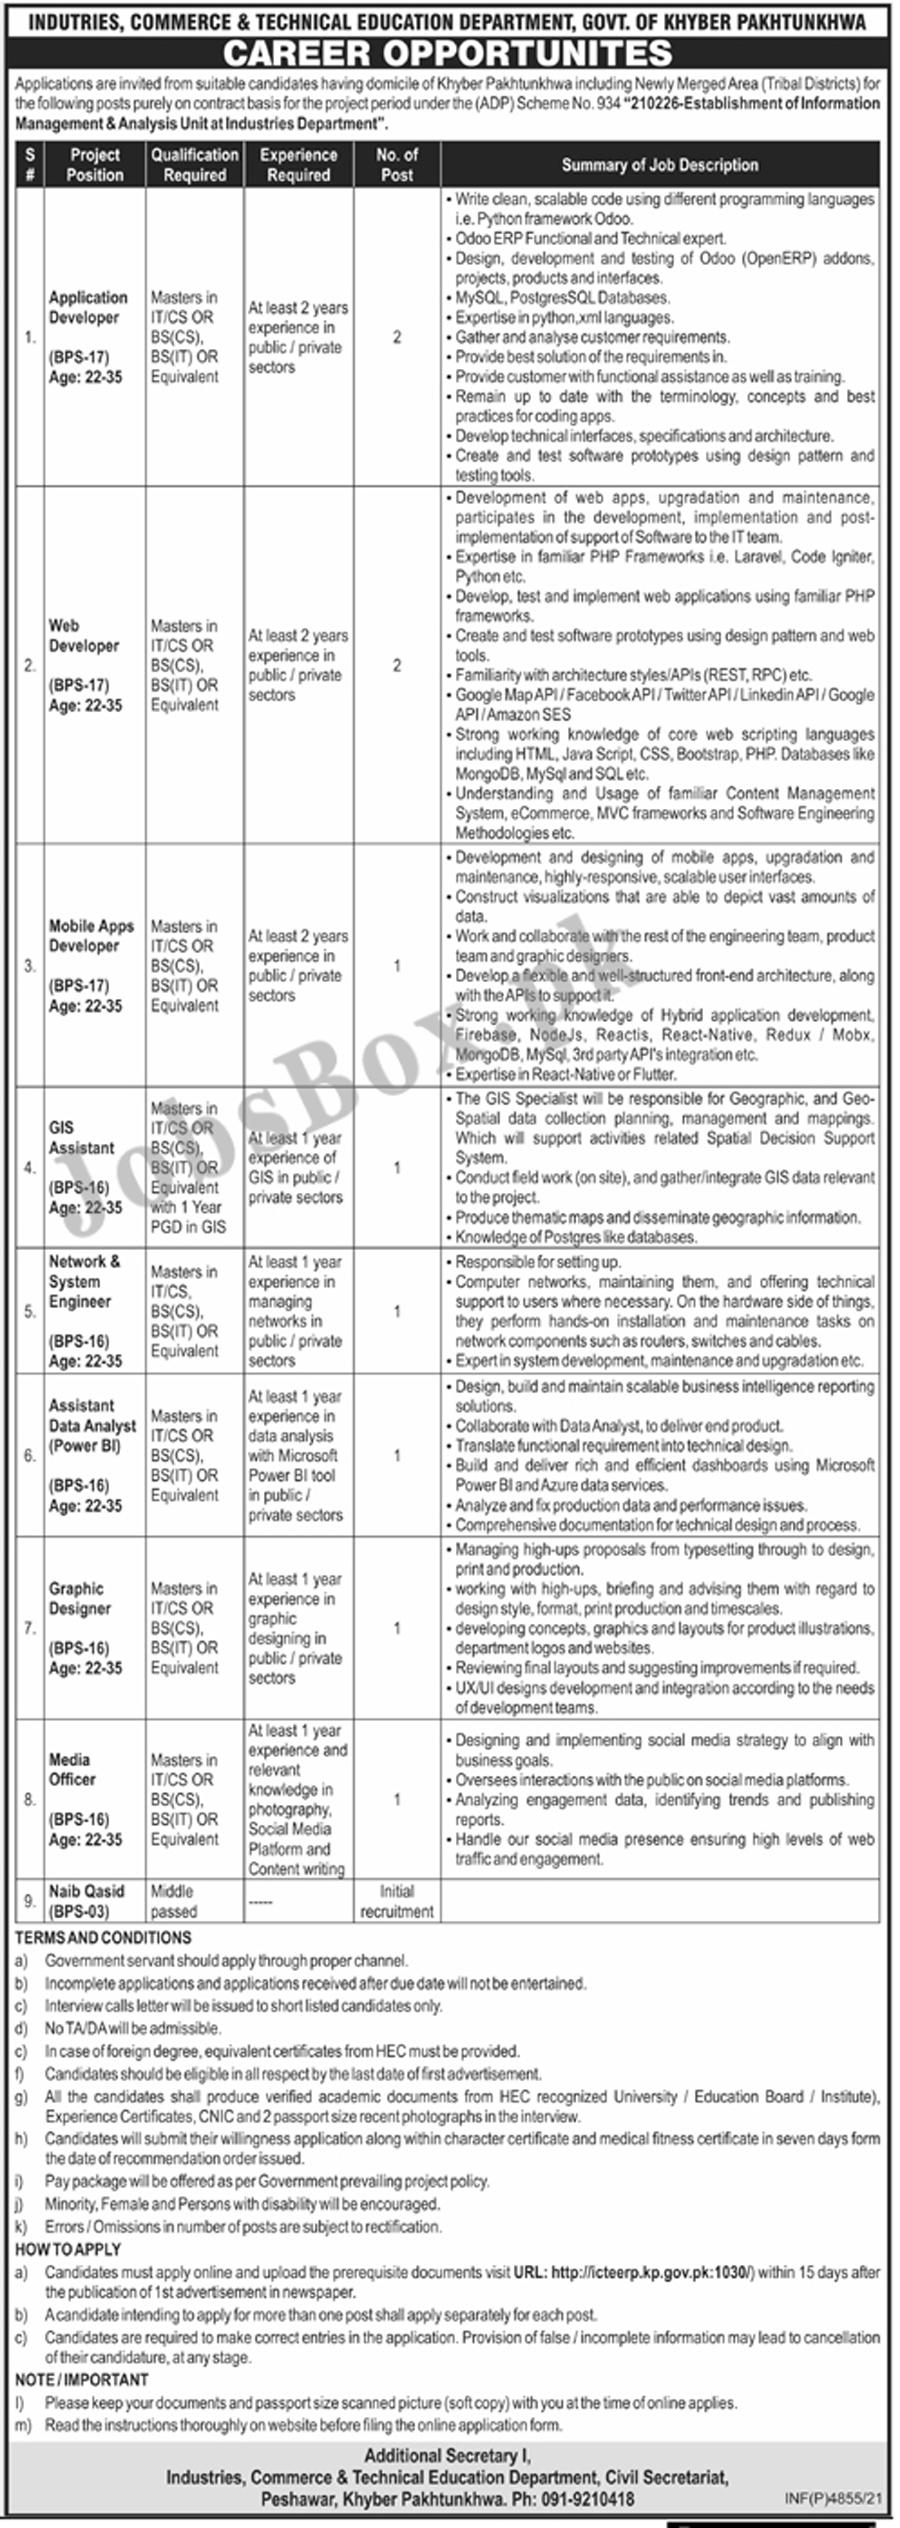 Industries, Commerce & Technical Education Department KPK Jobs 2021